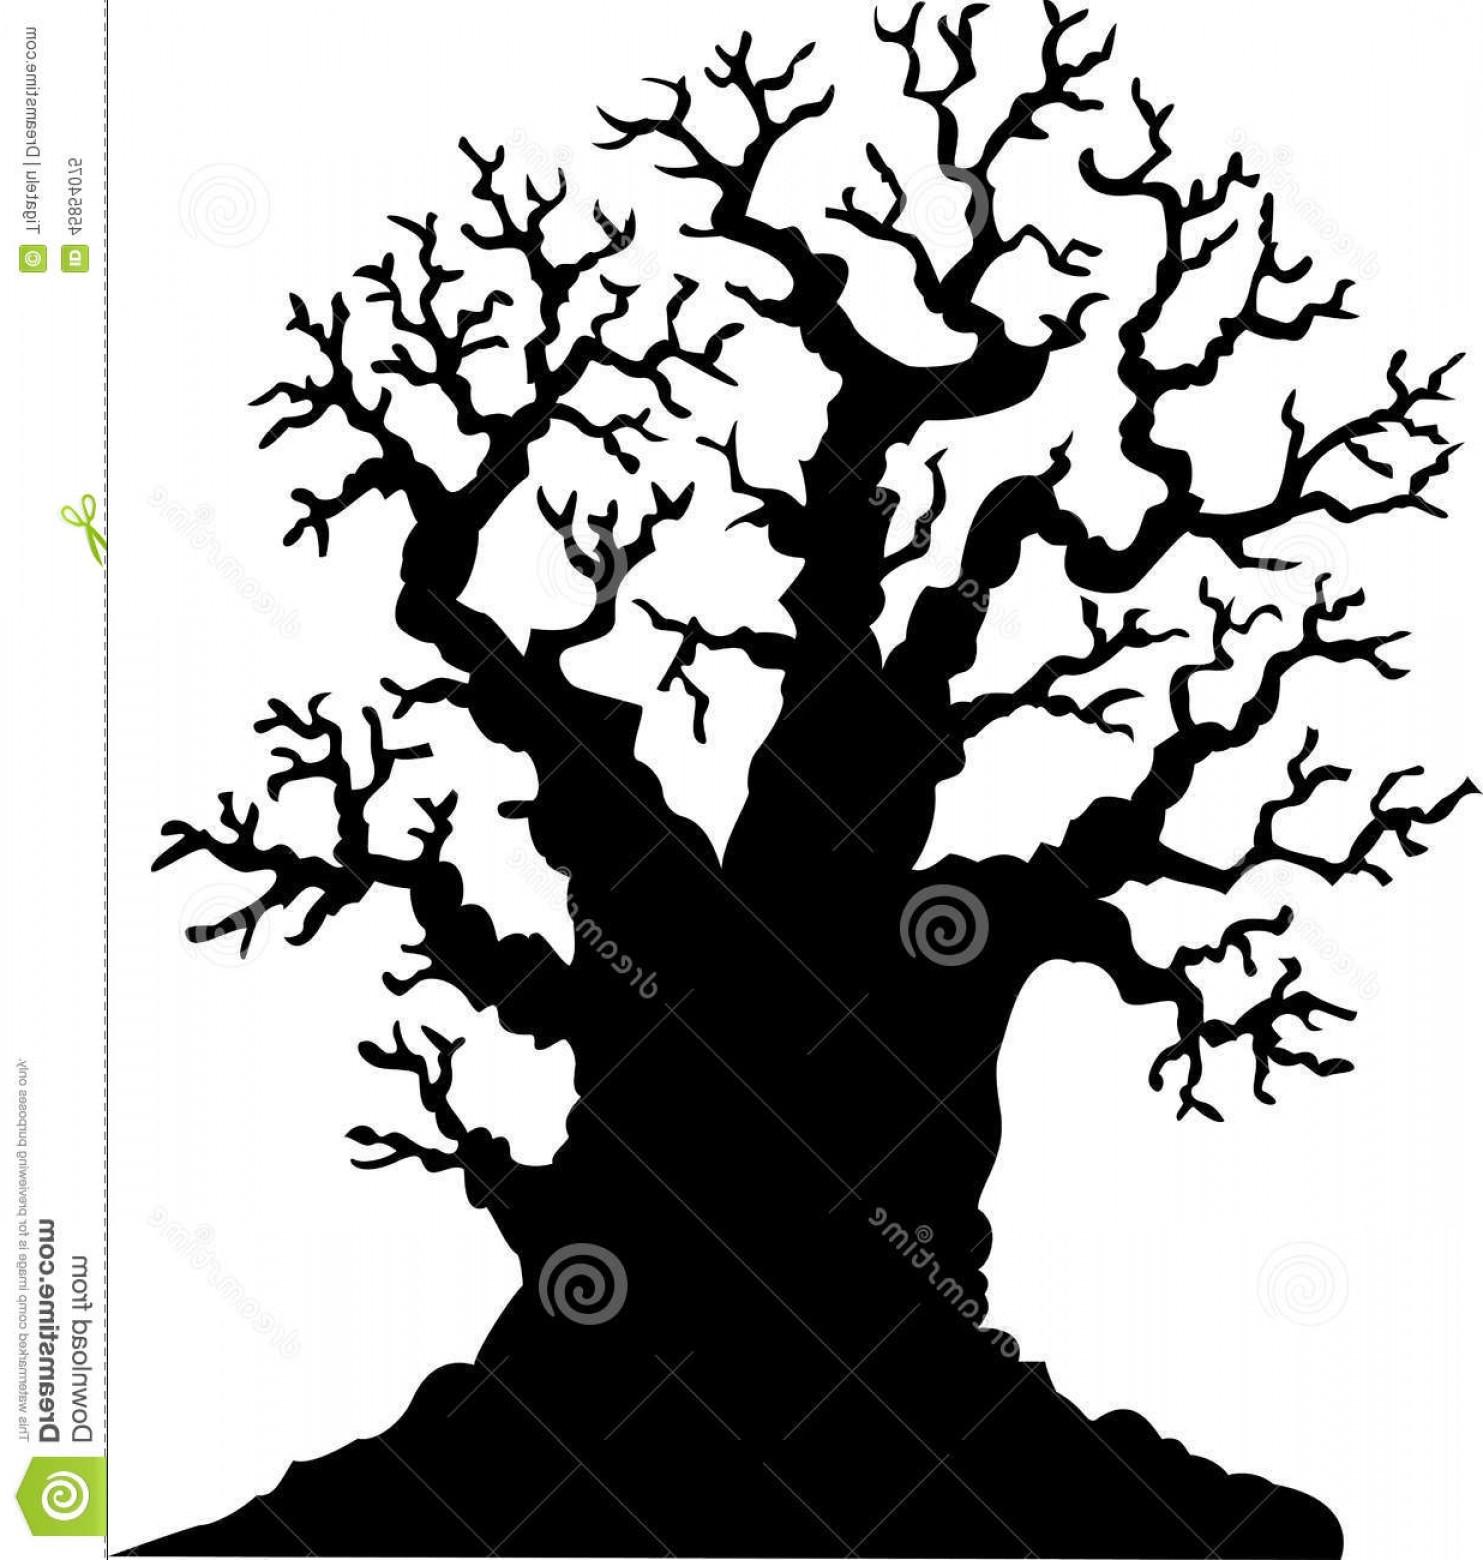 1483x1560 Stock Illustration Silhouette Leafless Oak Tree Cartoon